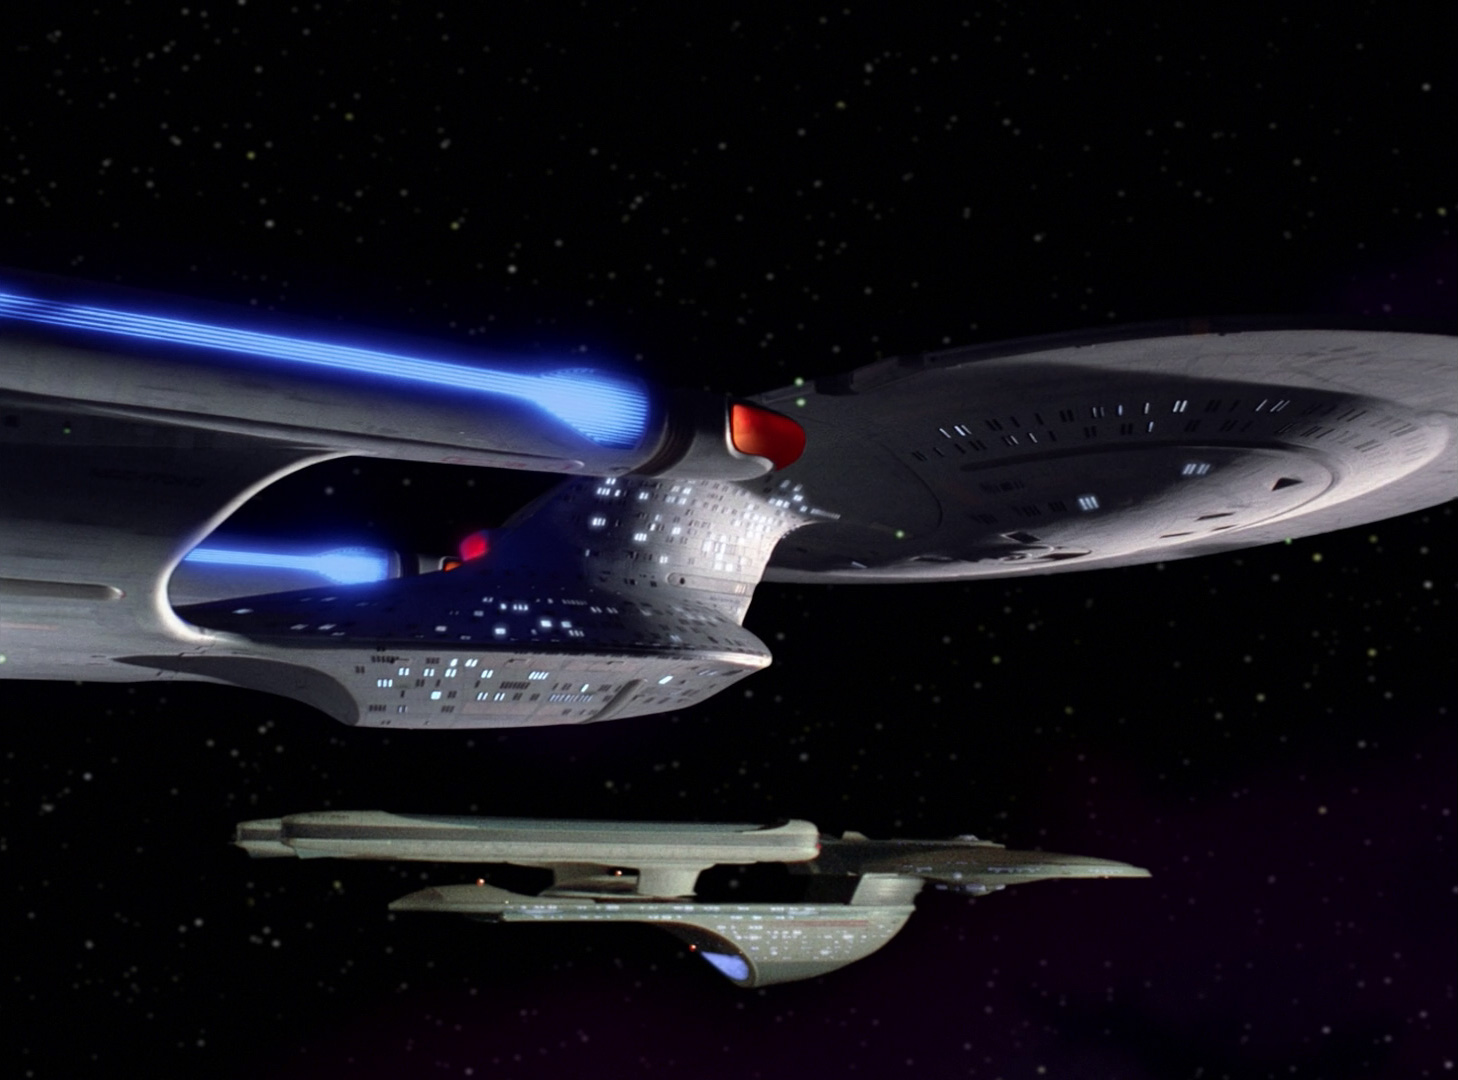 the enterprise-d parked next to an excelsior vessel